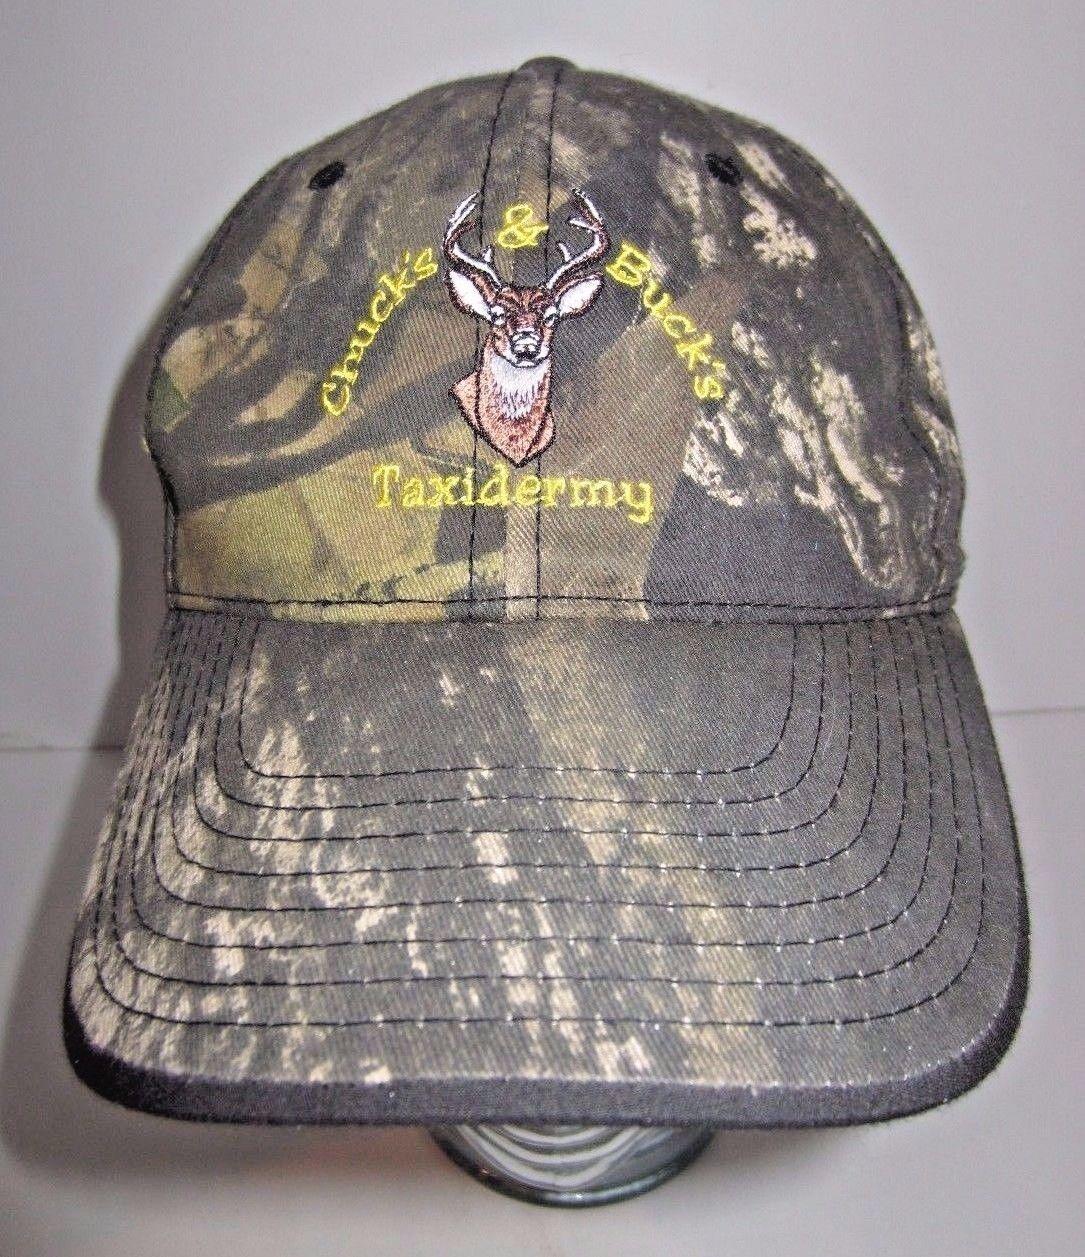 Chucks & Bucks Taxidermy Hat Cap - Deer - Camouflage - Snapback - Anderson SC - $17.77